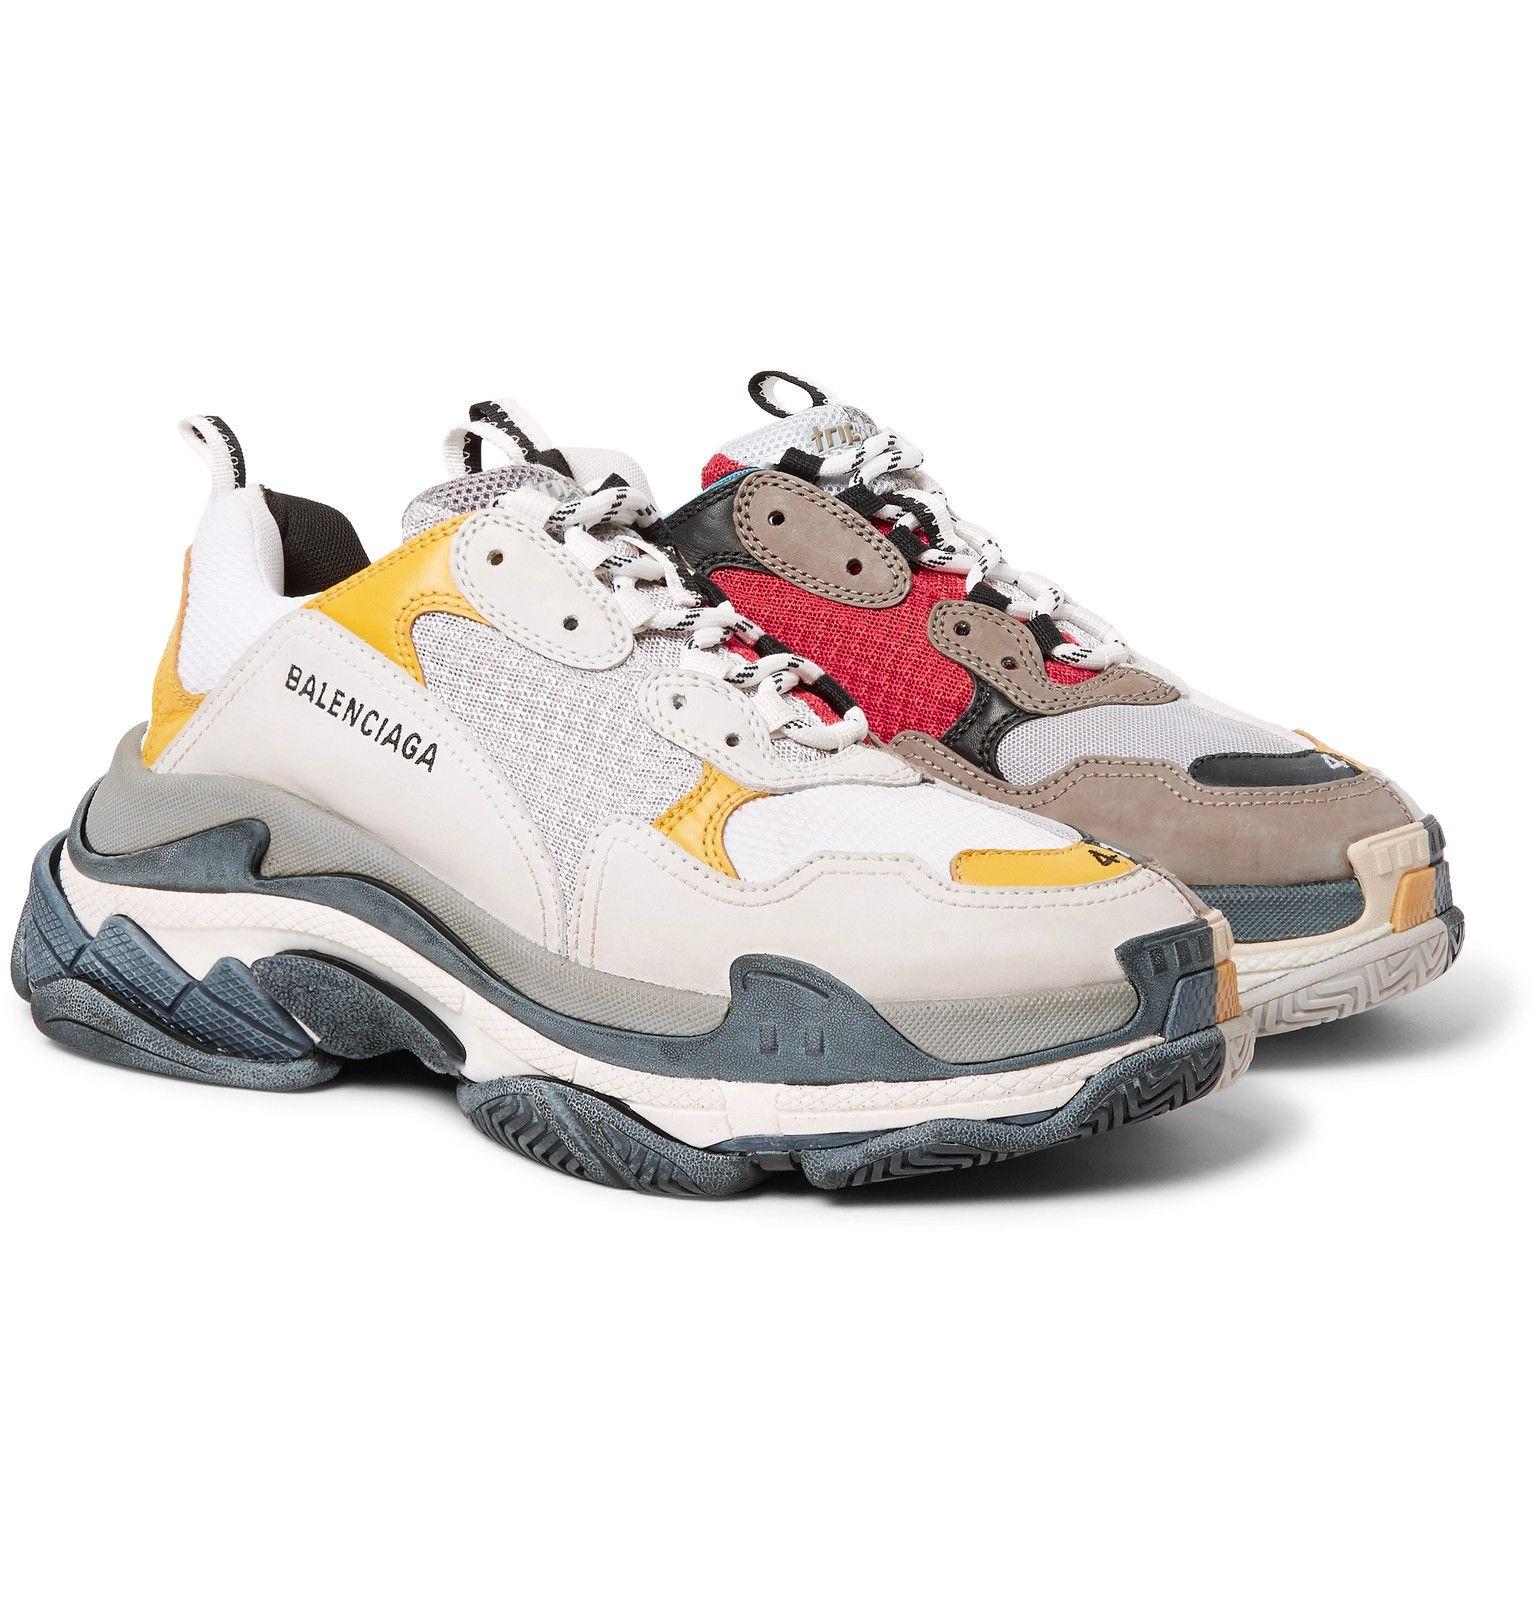 Ardiente Orgullo Anual  Balenciaga - Triple S Mesh, Nubuck and Leather Sneakers - Men - Multi |  Balenciaga shoes mens, Sneakers, Balenciaga shoes